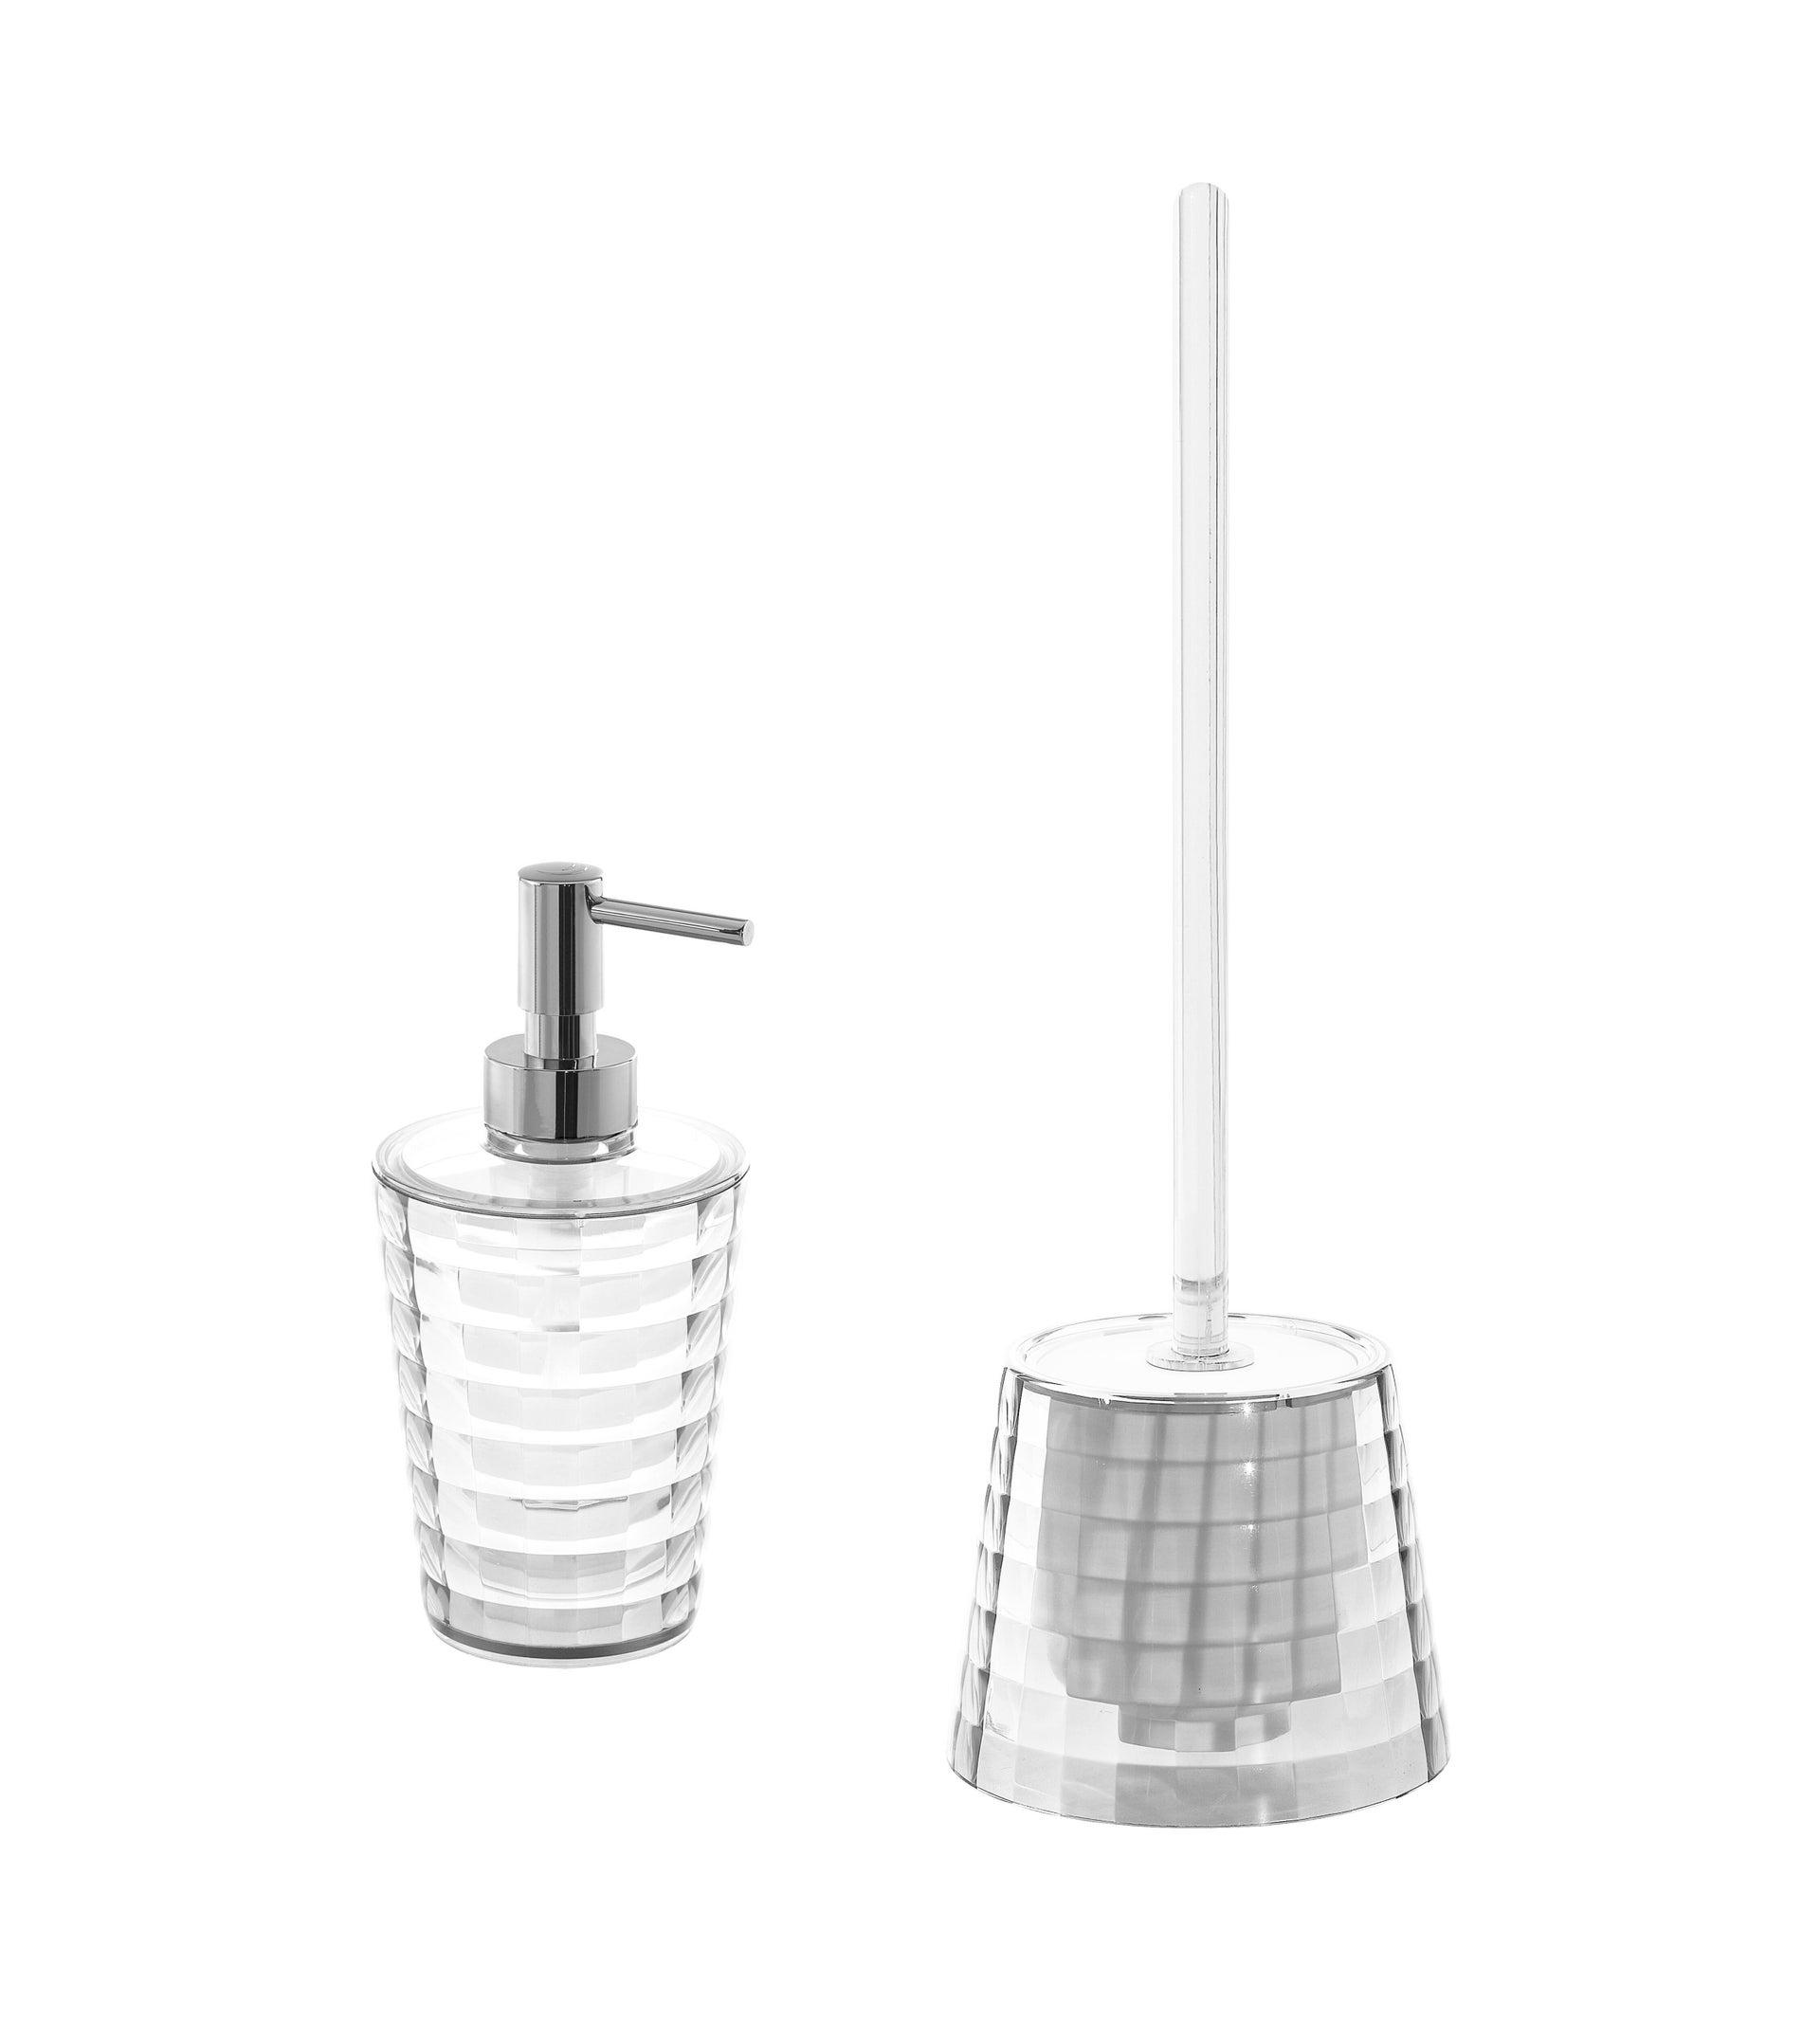 Set di accessori per bagno trasparente in plastica